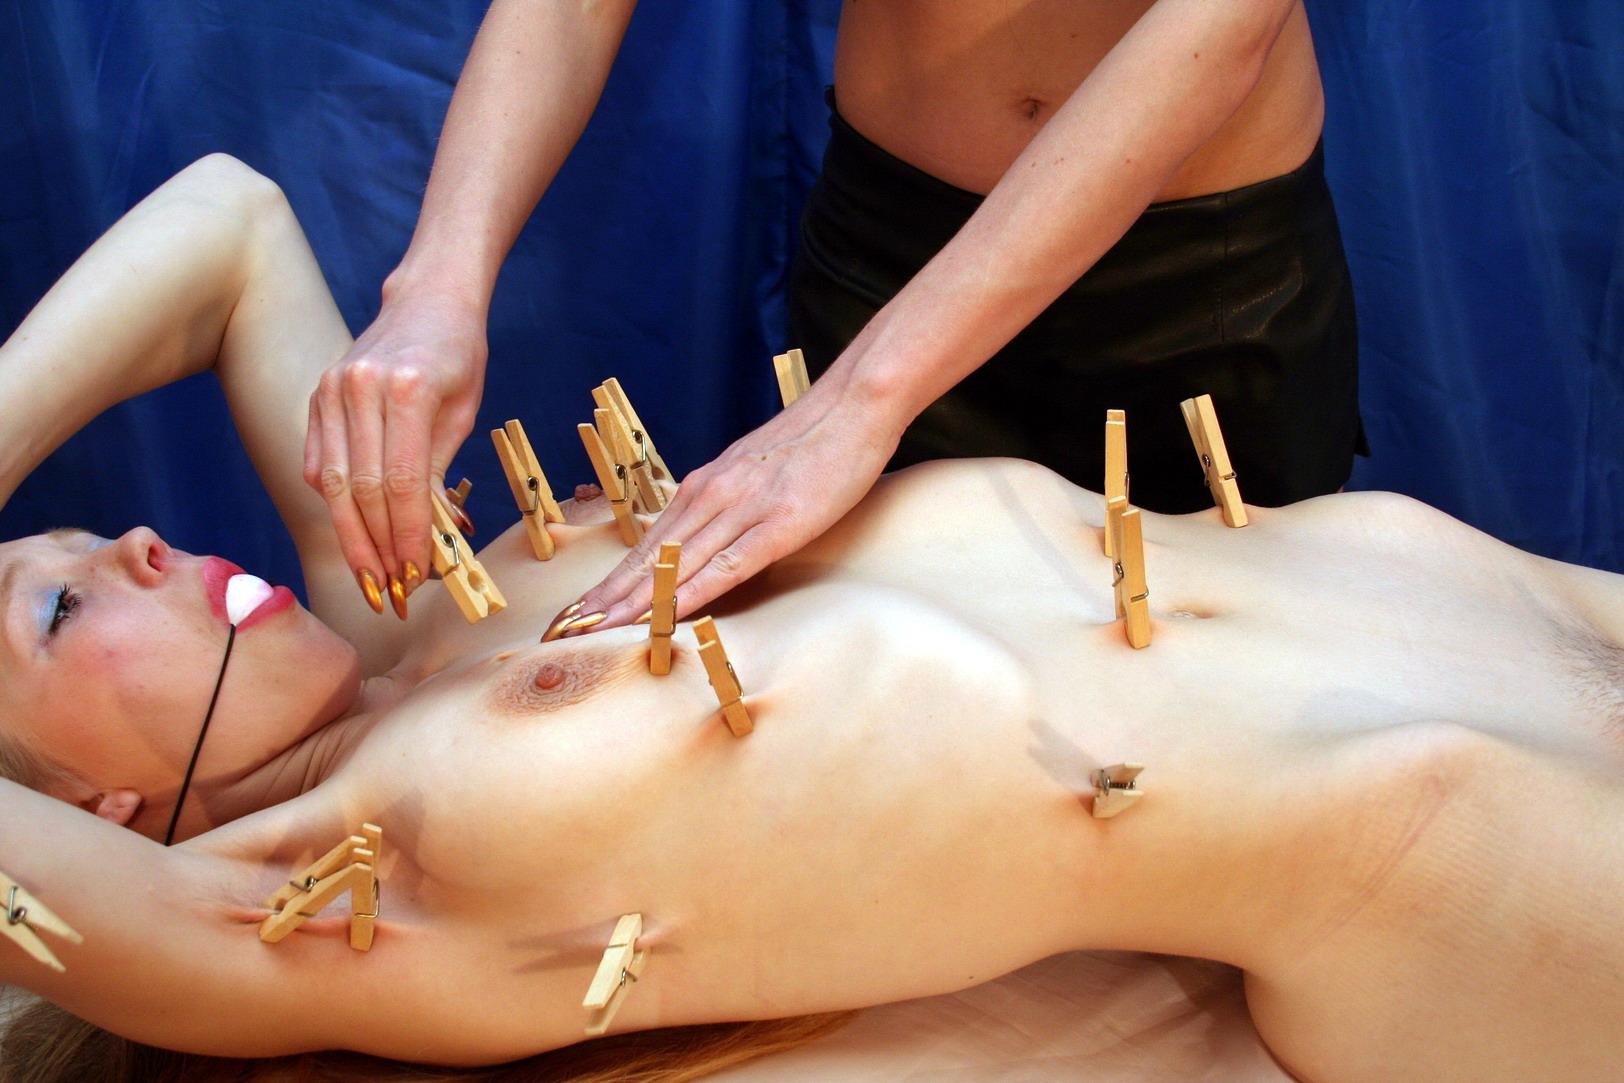 sensual nude massage clips